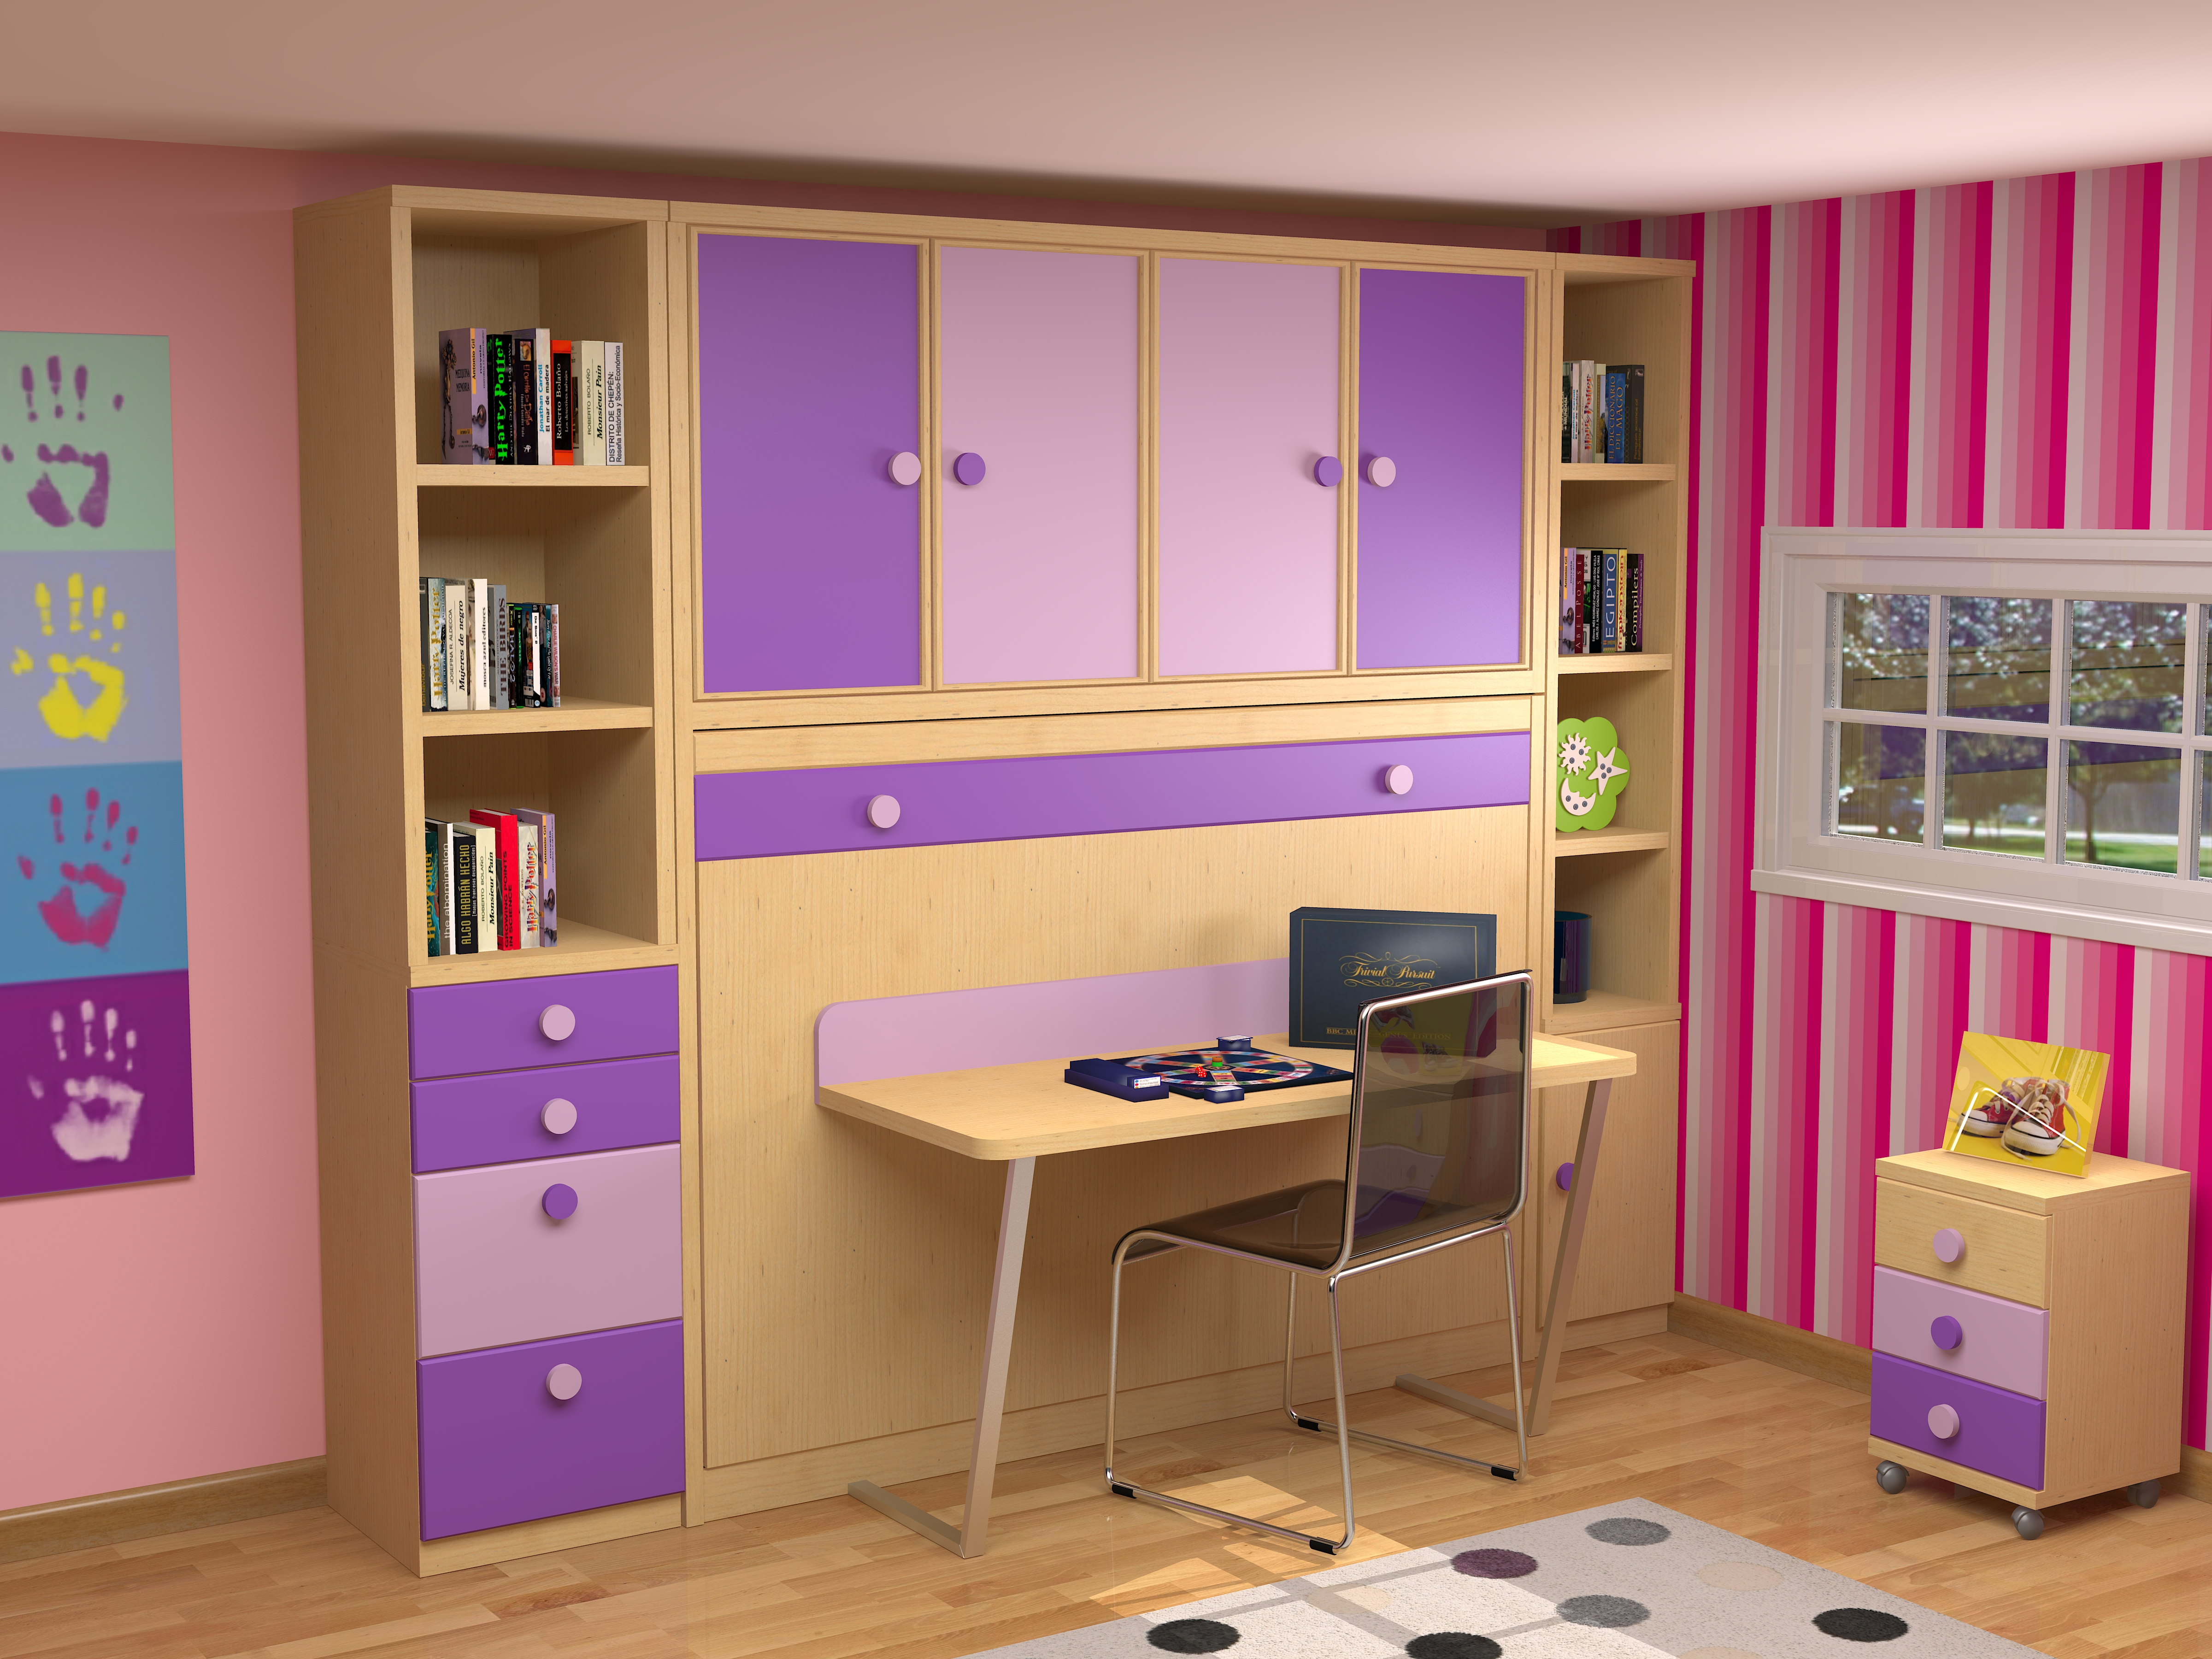 ... Kimobel. Diseu00f1o, muebles, decoraciu00f3n. La Vall du0026#39;Uixu00f3 - 964 74 00 53